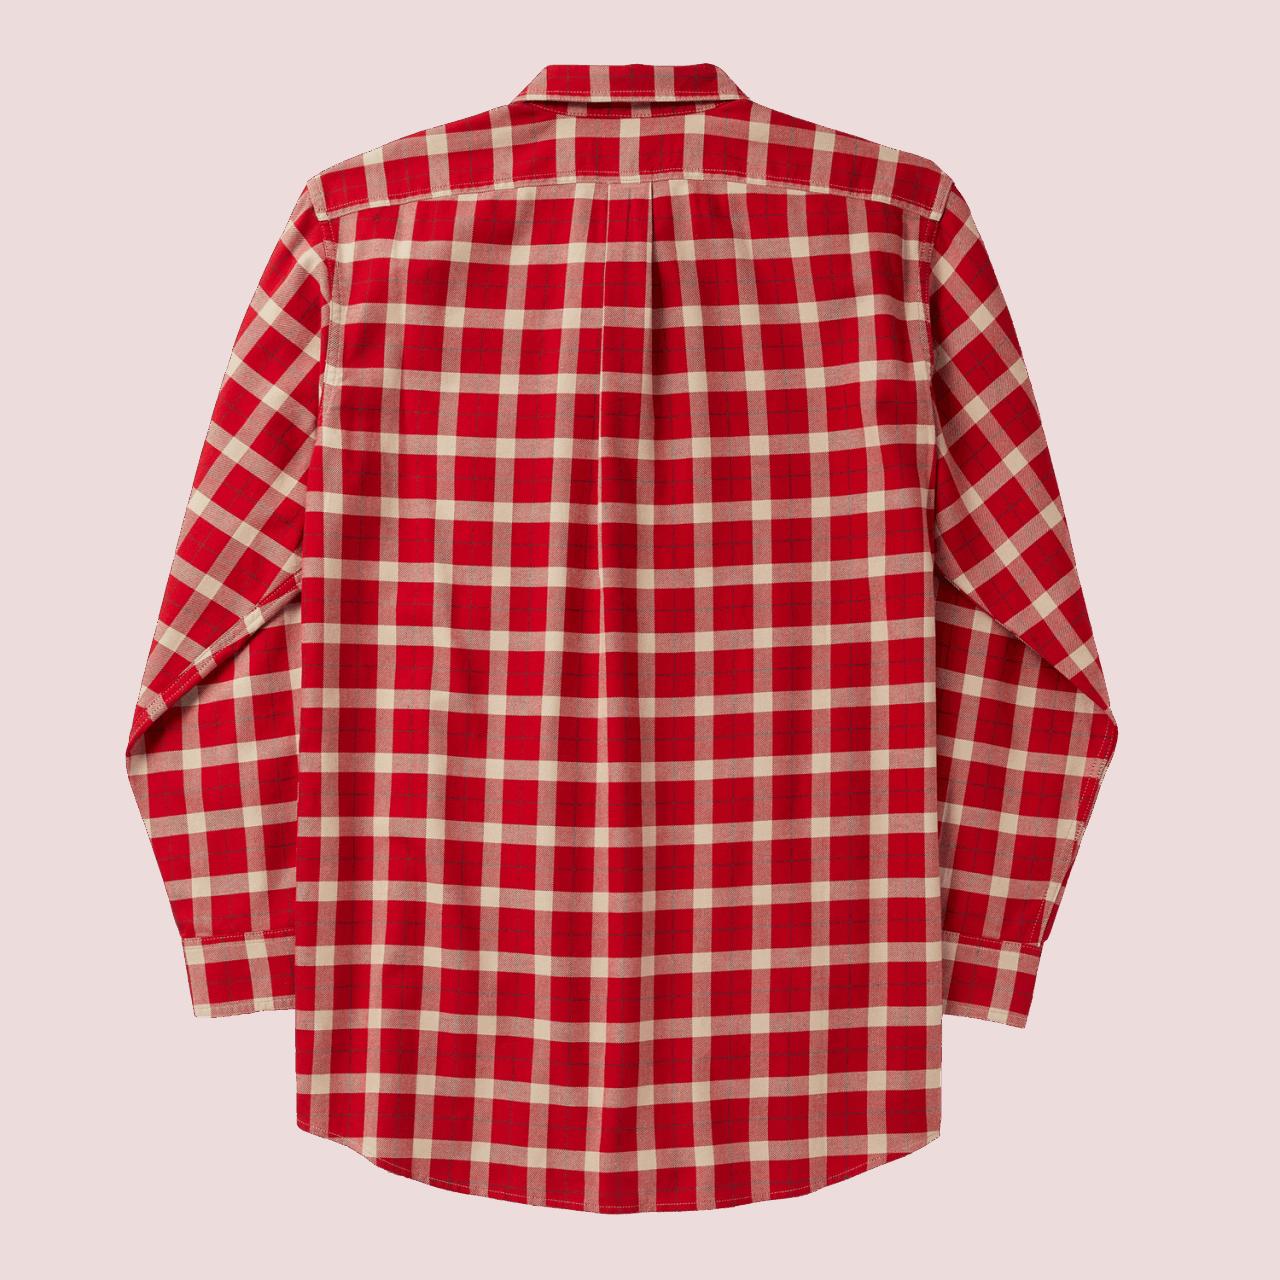 Filson LT Alaskan Guide Shirt red/cream